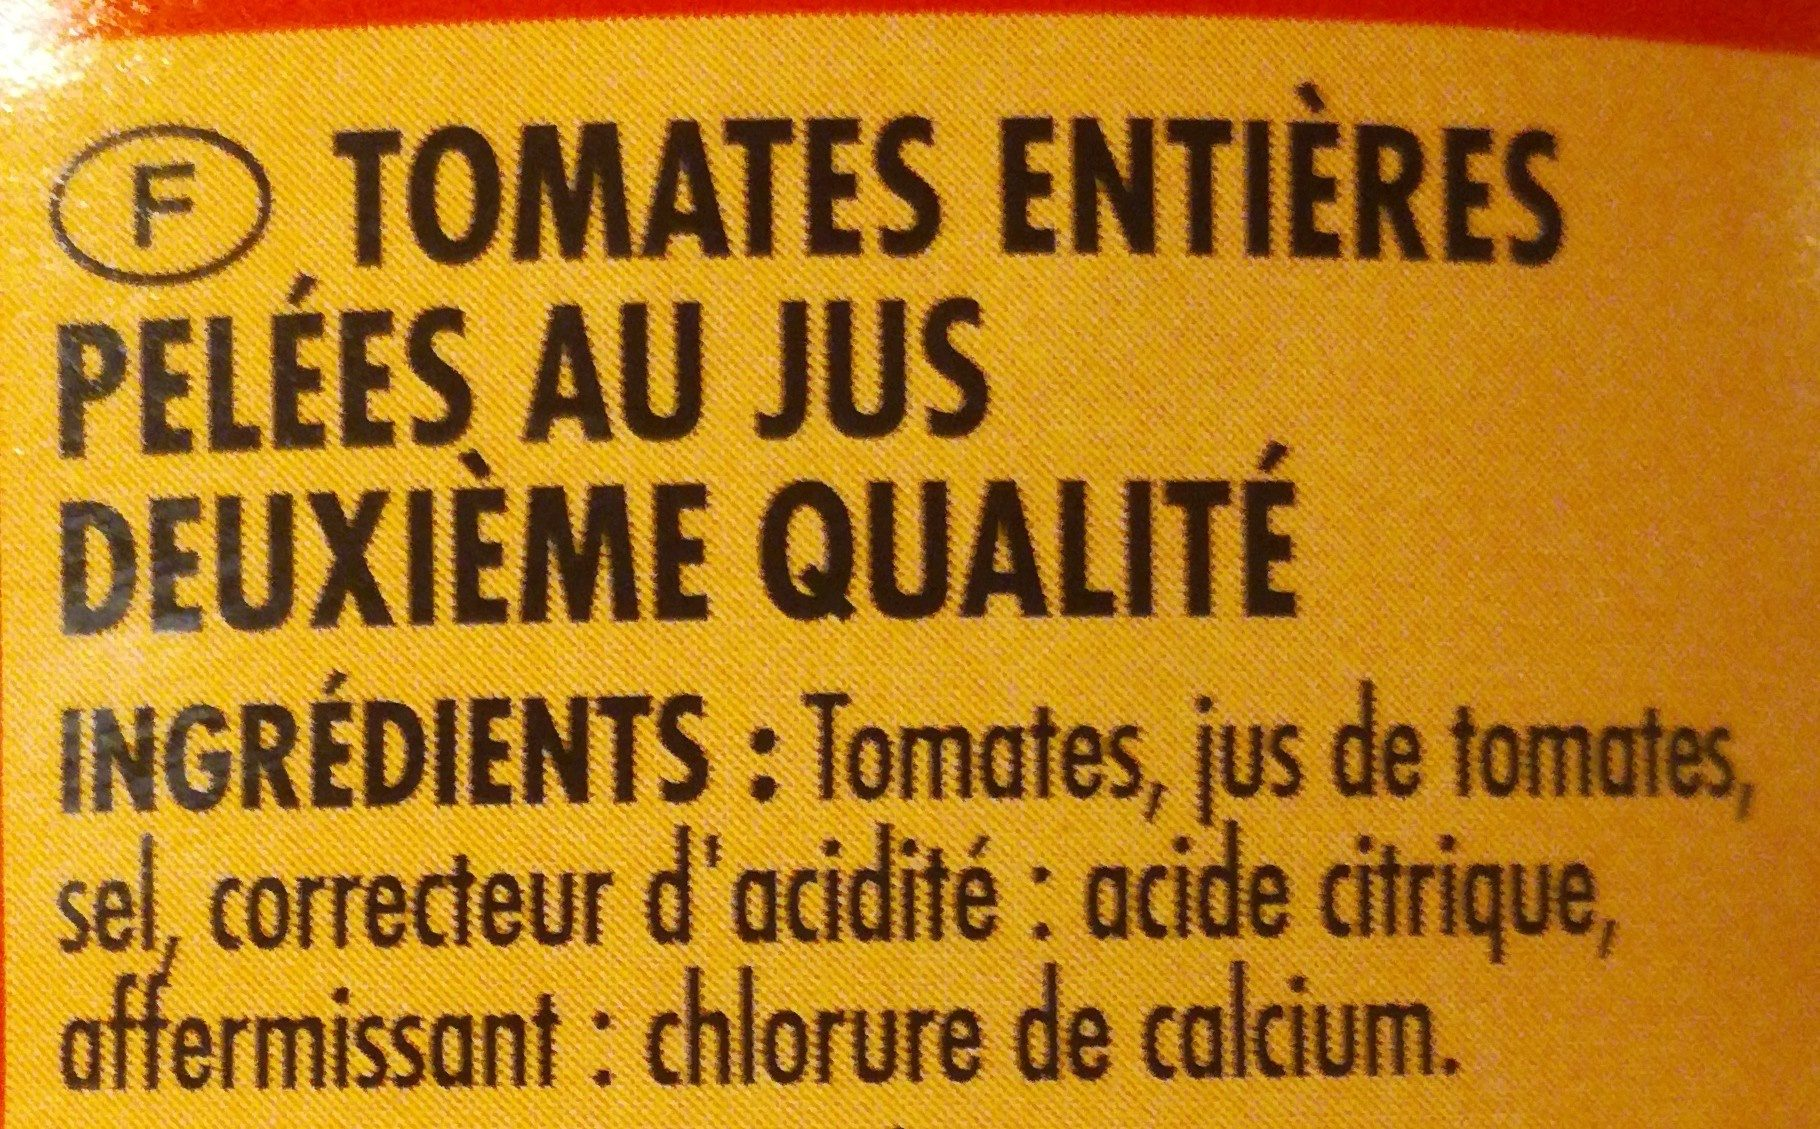 Tomates entières pelées 4/4 - Ingredients - fr